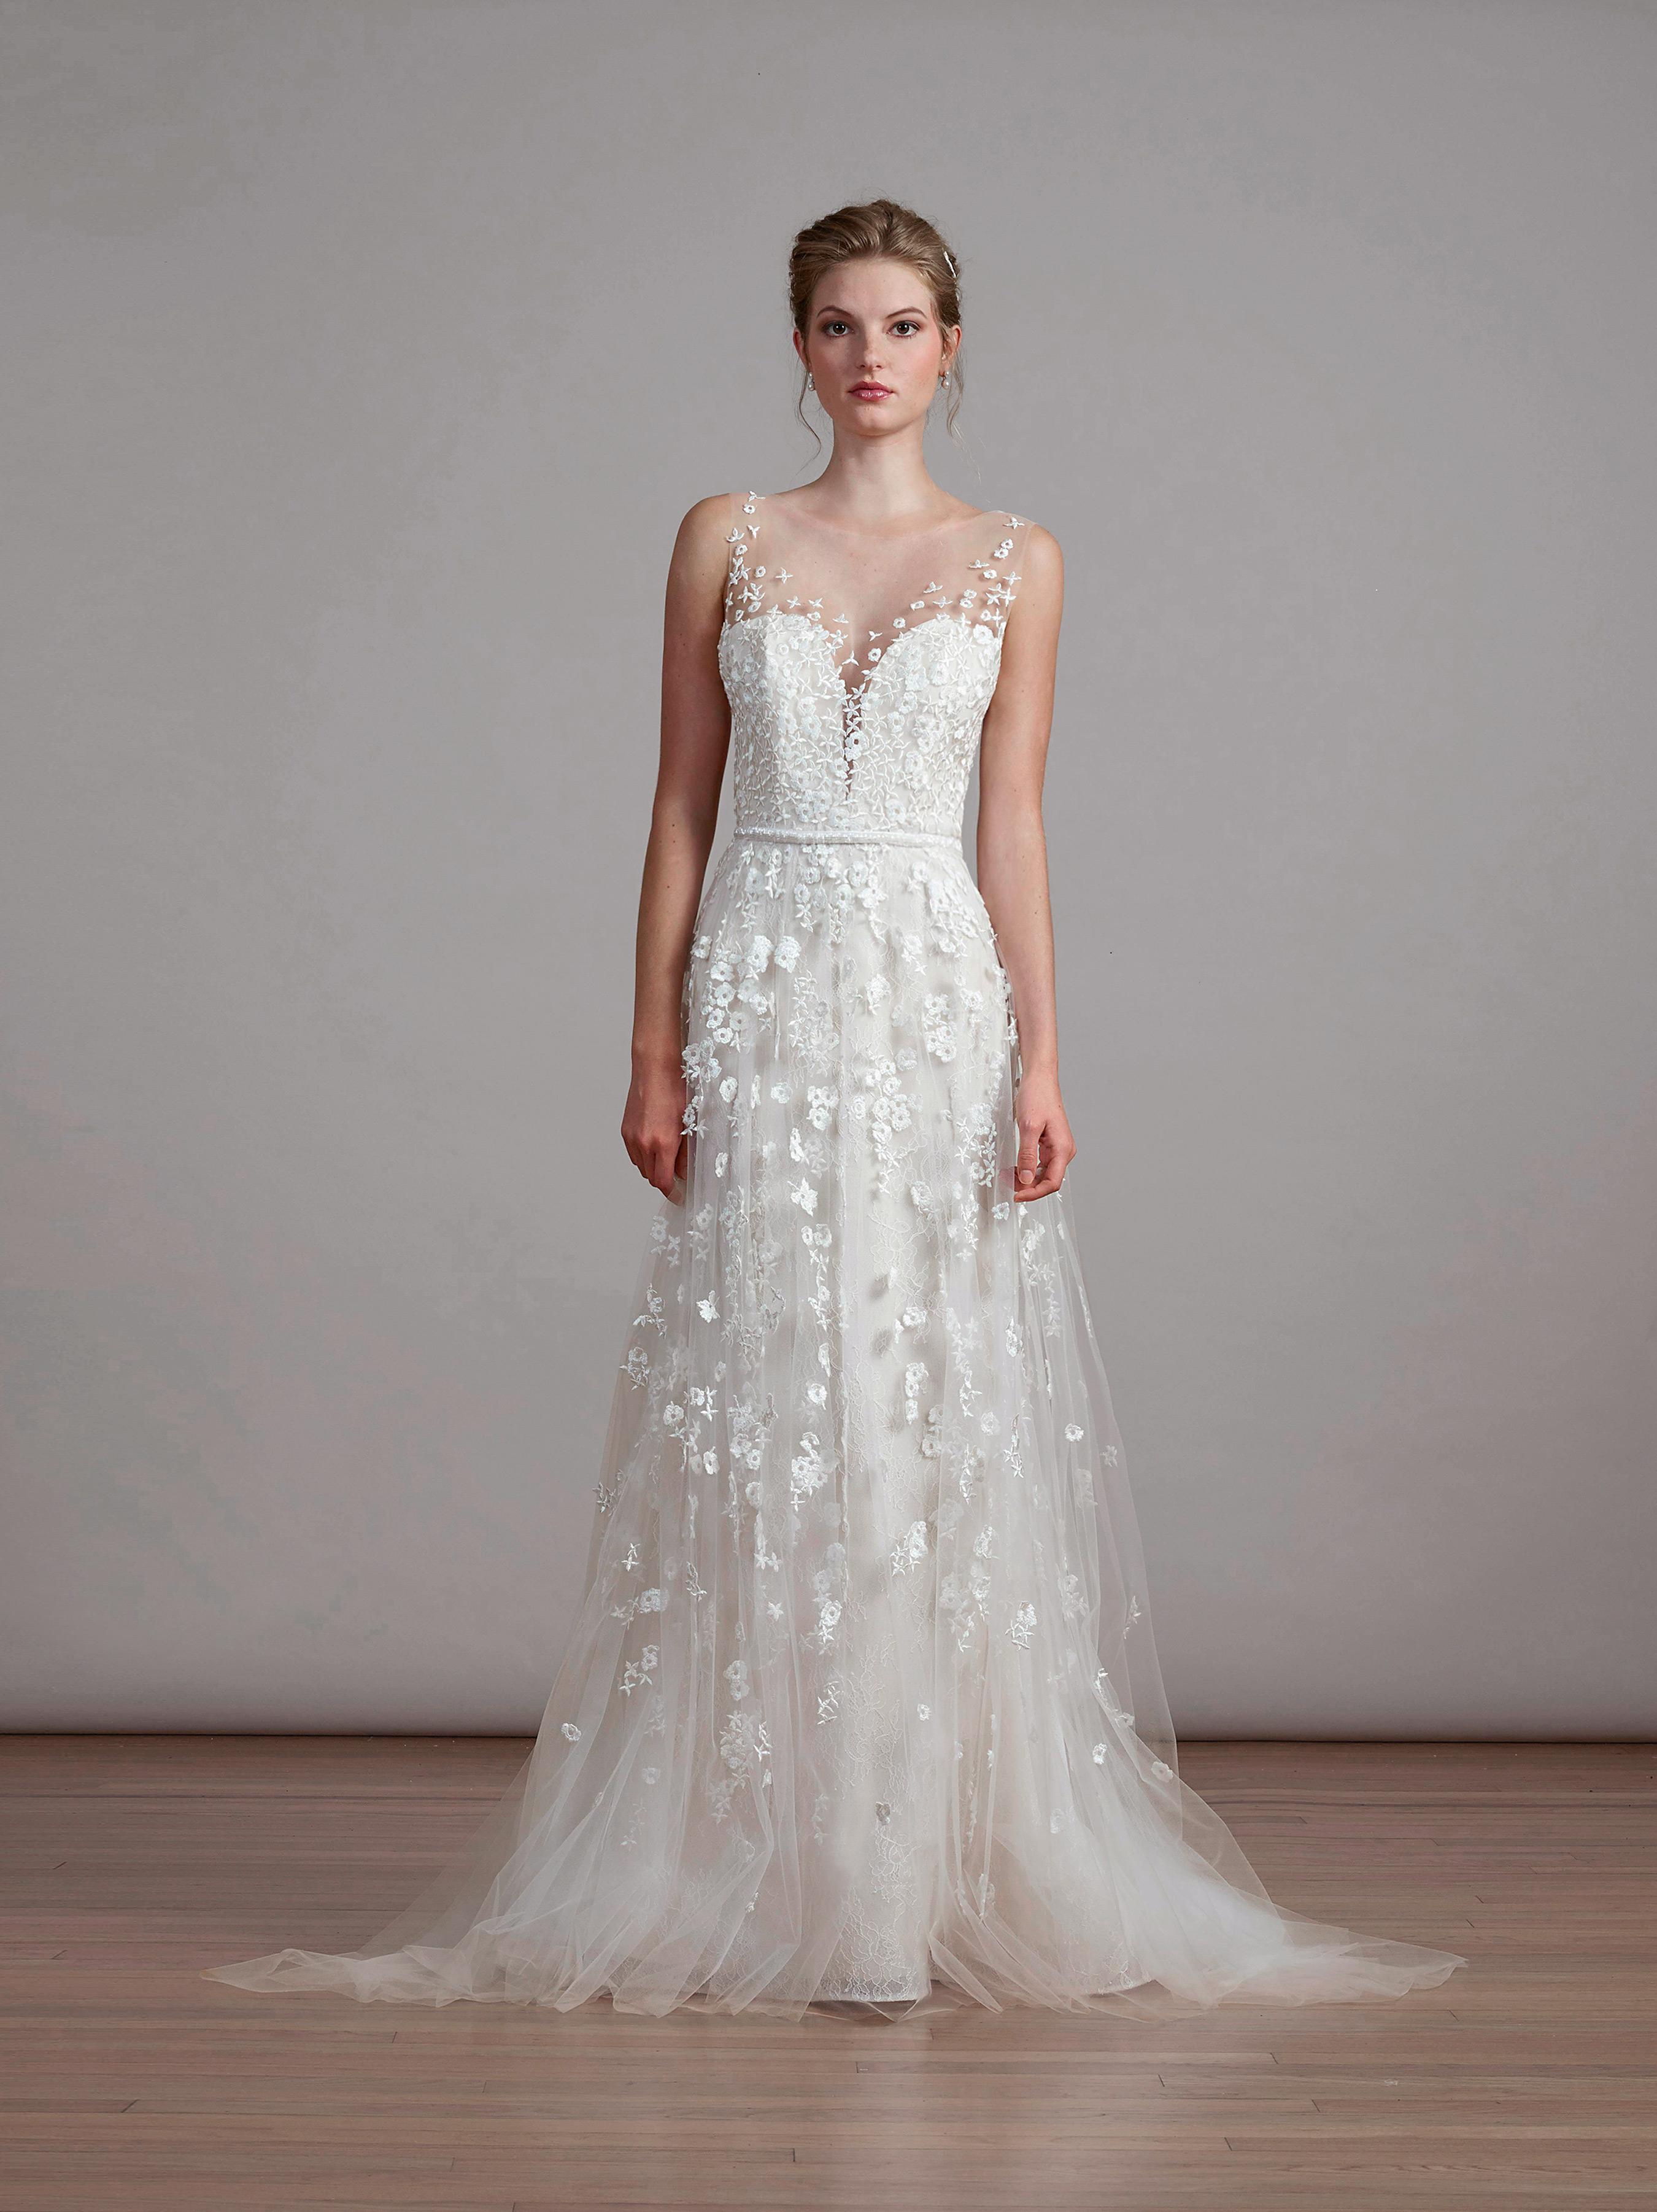 liancarlo lace wedding dress with illusion neckline